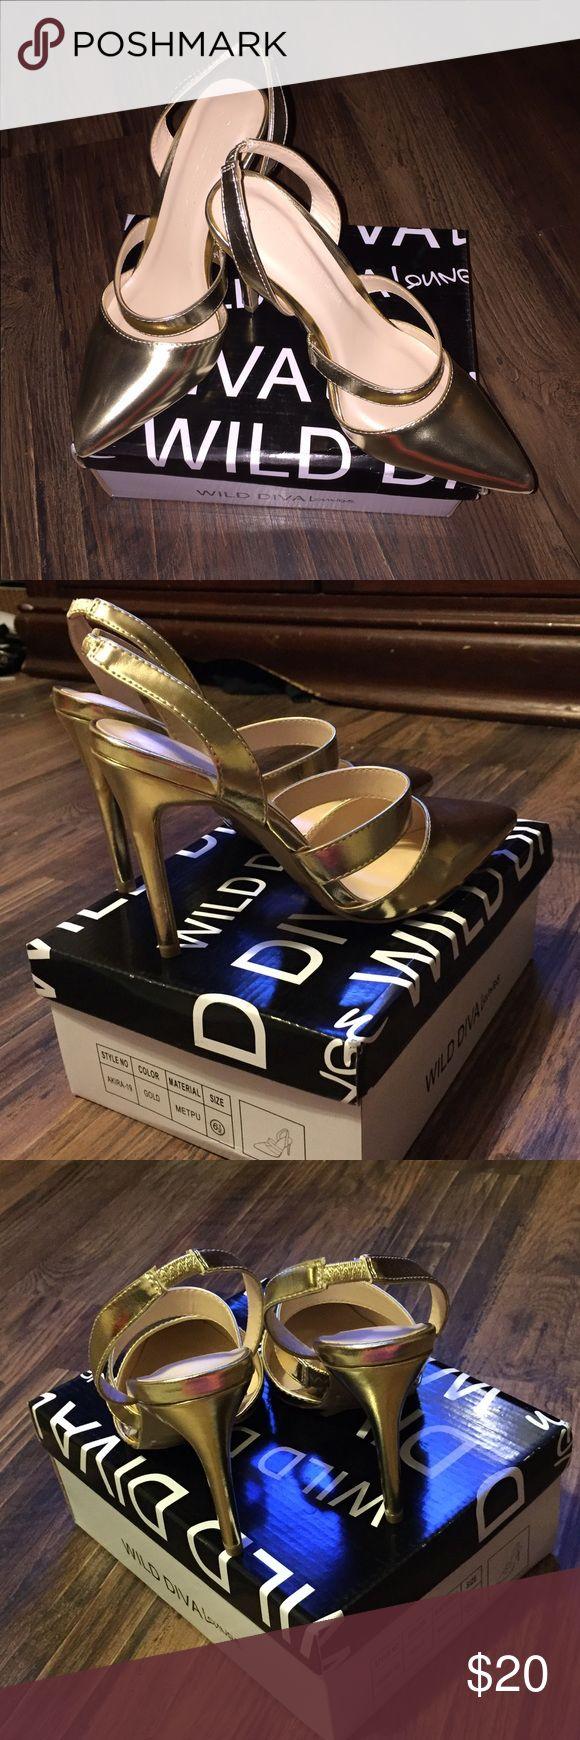 "Gold stilettos by Wild Diva NIB Gold heels by Wild Diva. Heel strap has some stretch. 4"" heel. Cushioned sole. Wild Diva Shoes"